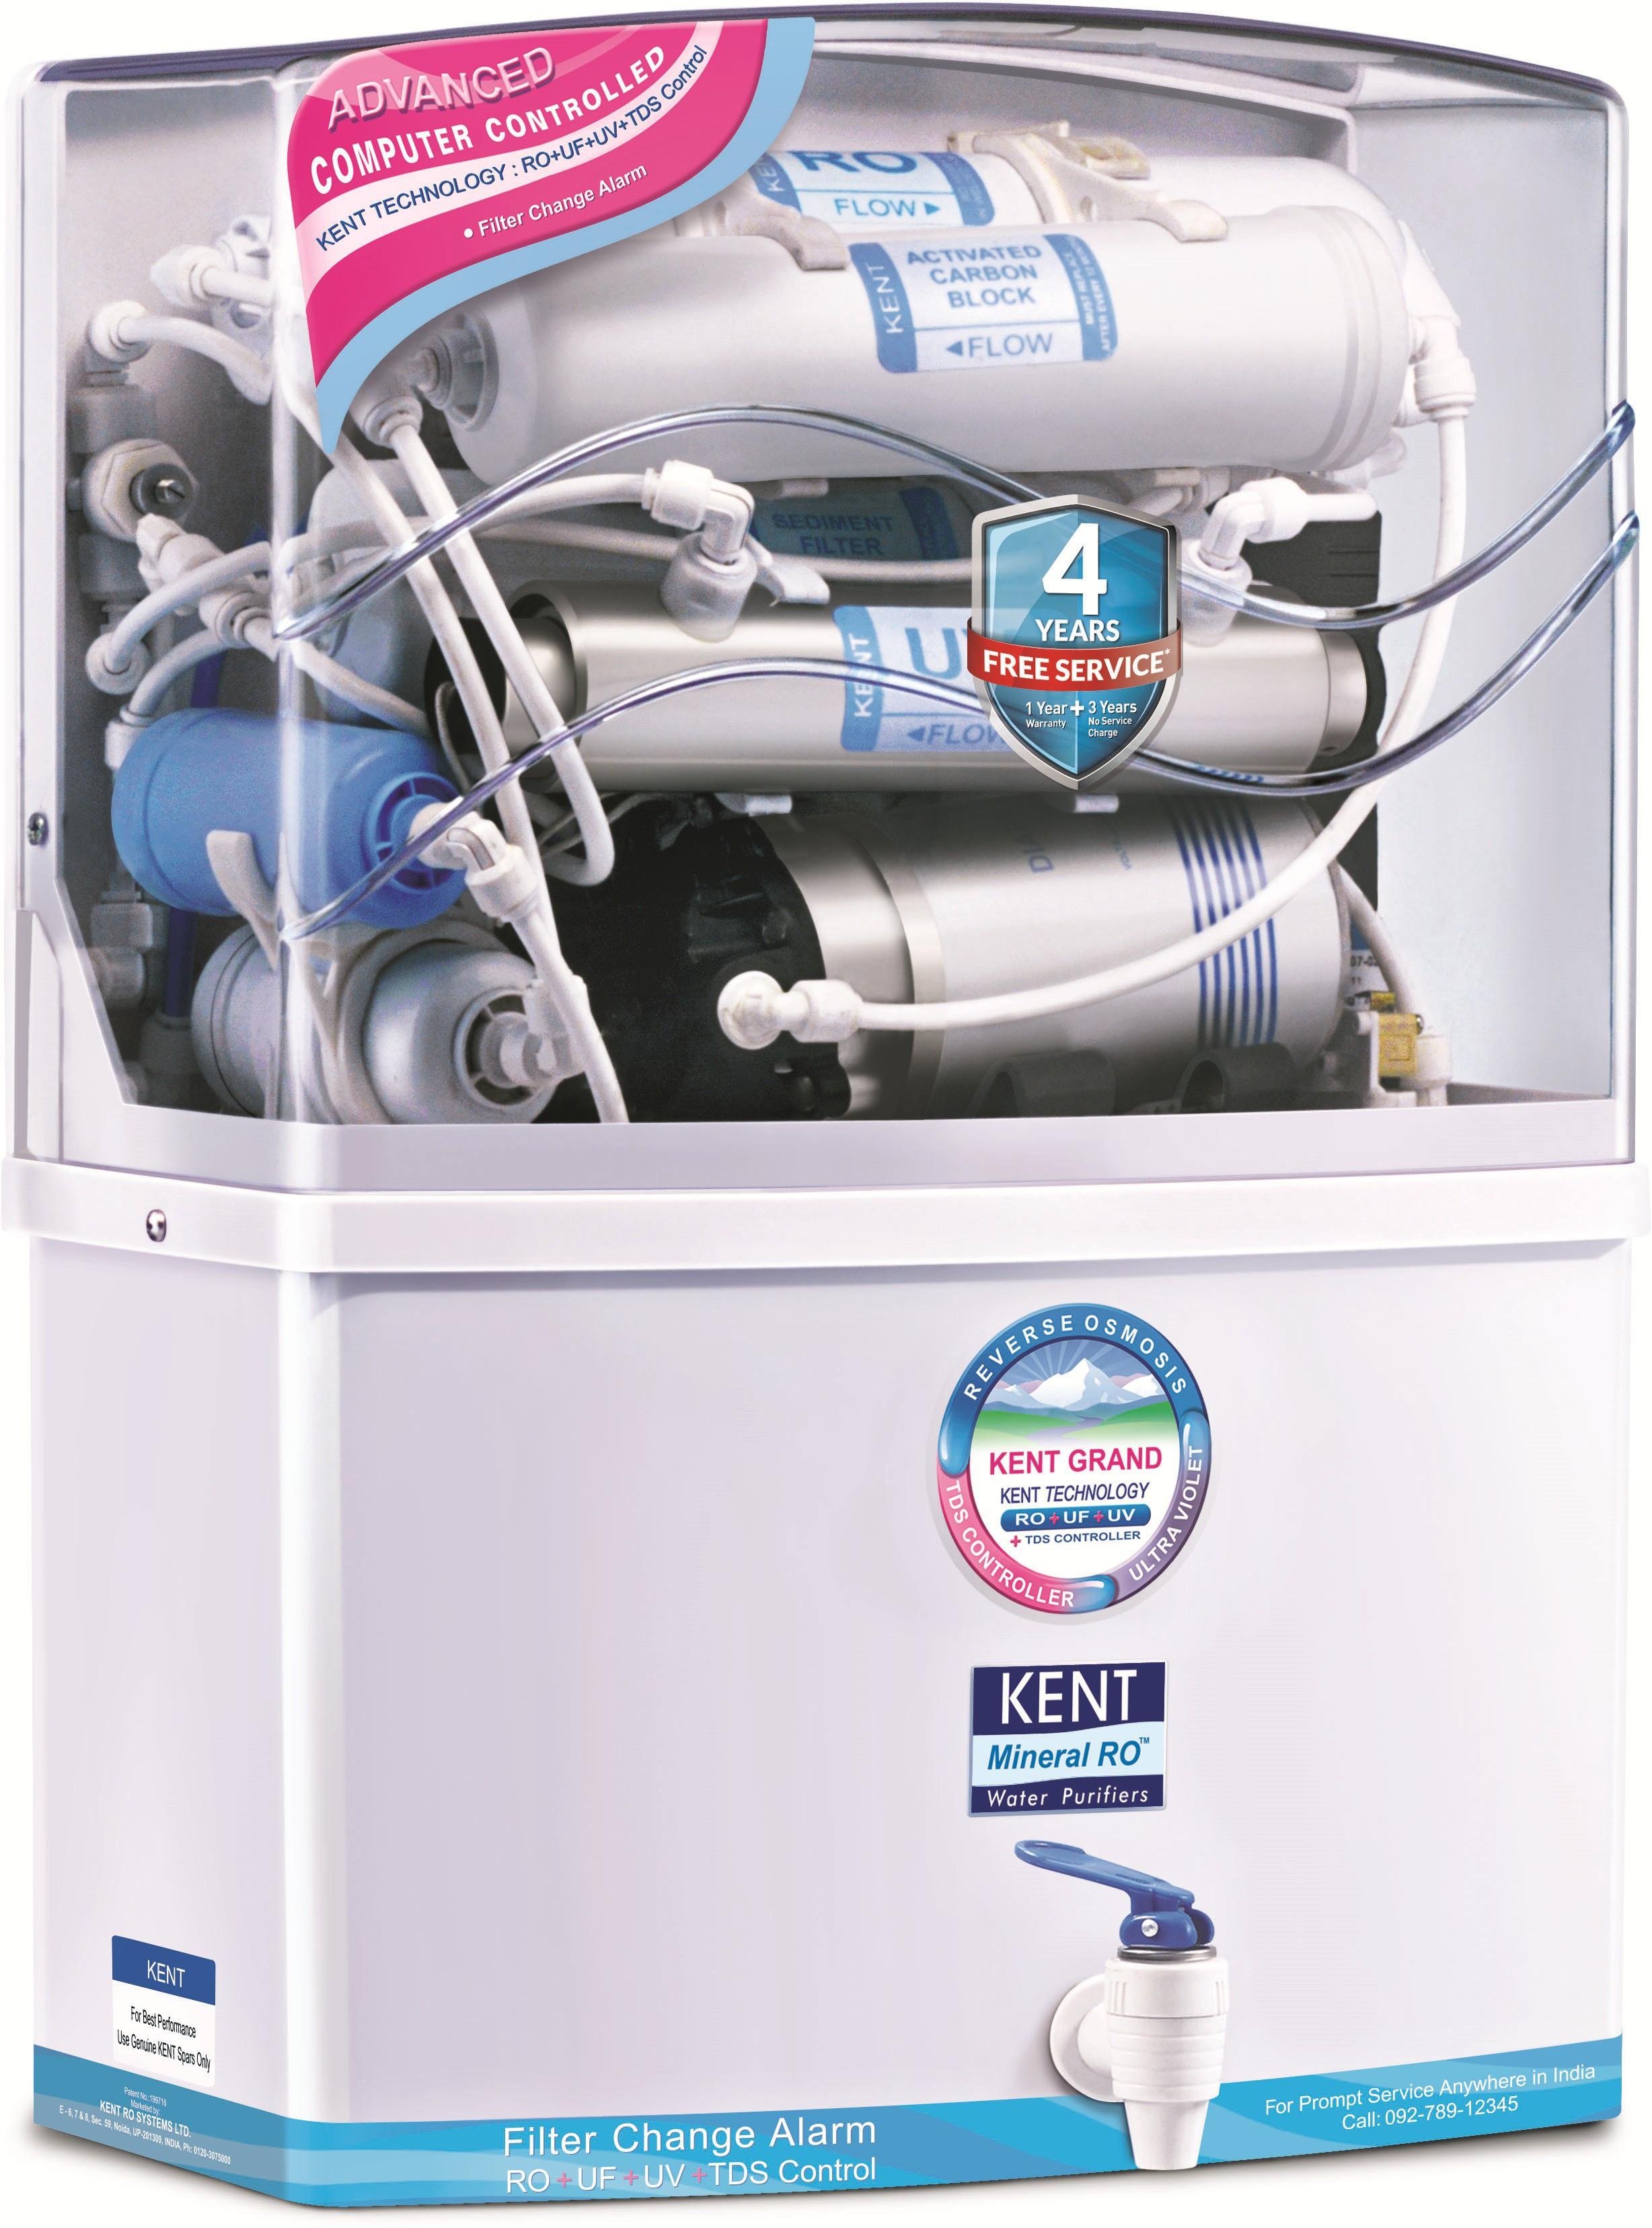 Kent Grand Mineral 11007 8 L Ro Uv Uf Water Purifier